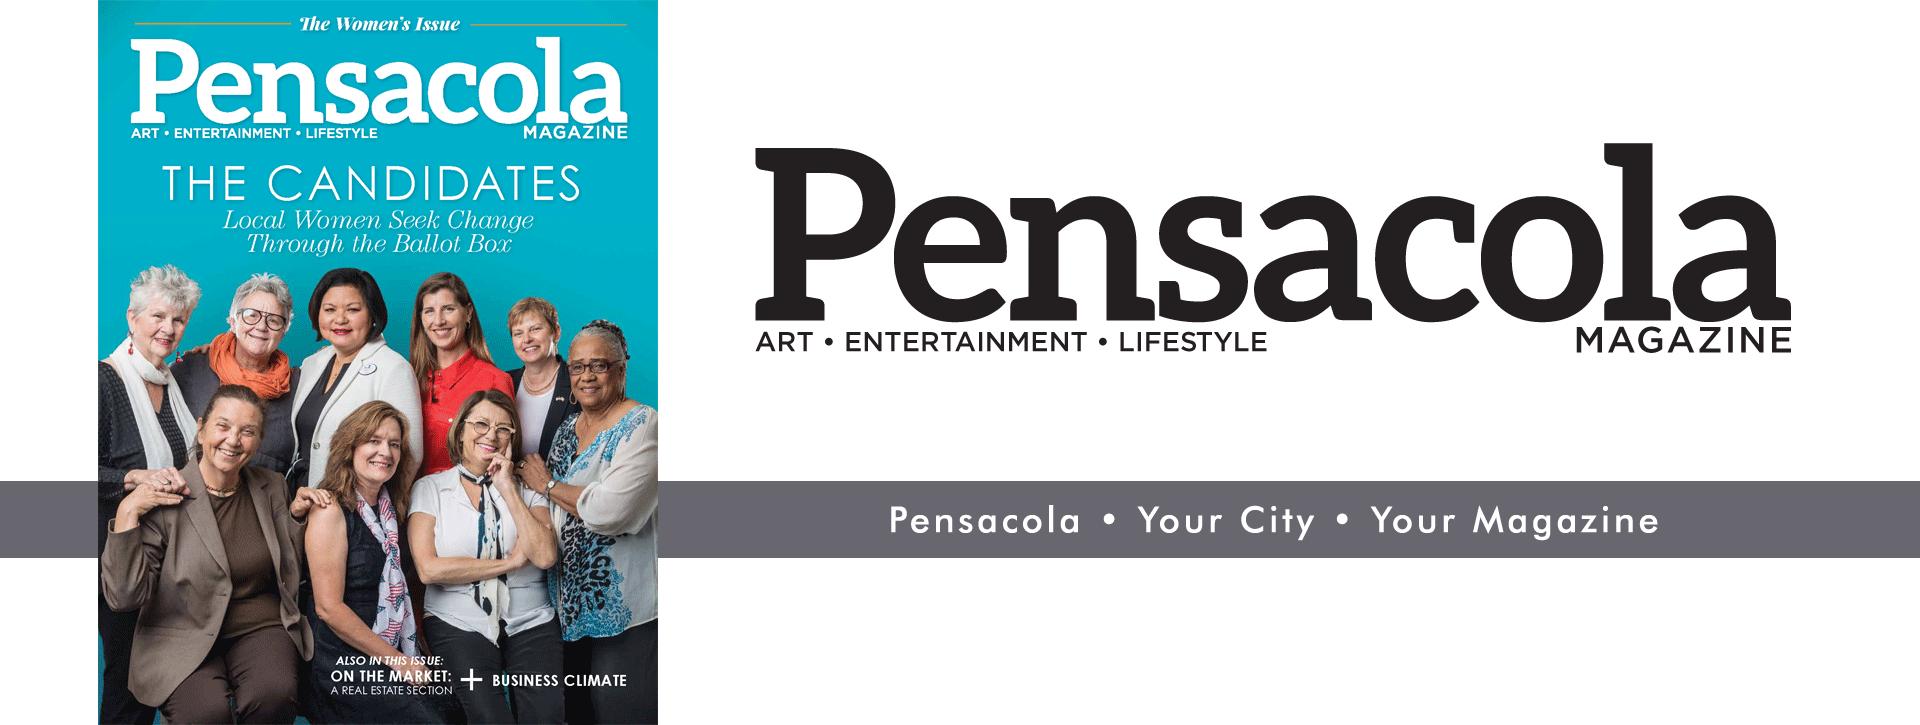 Pensacola Magazine, July 2018